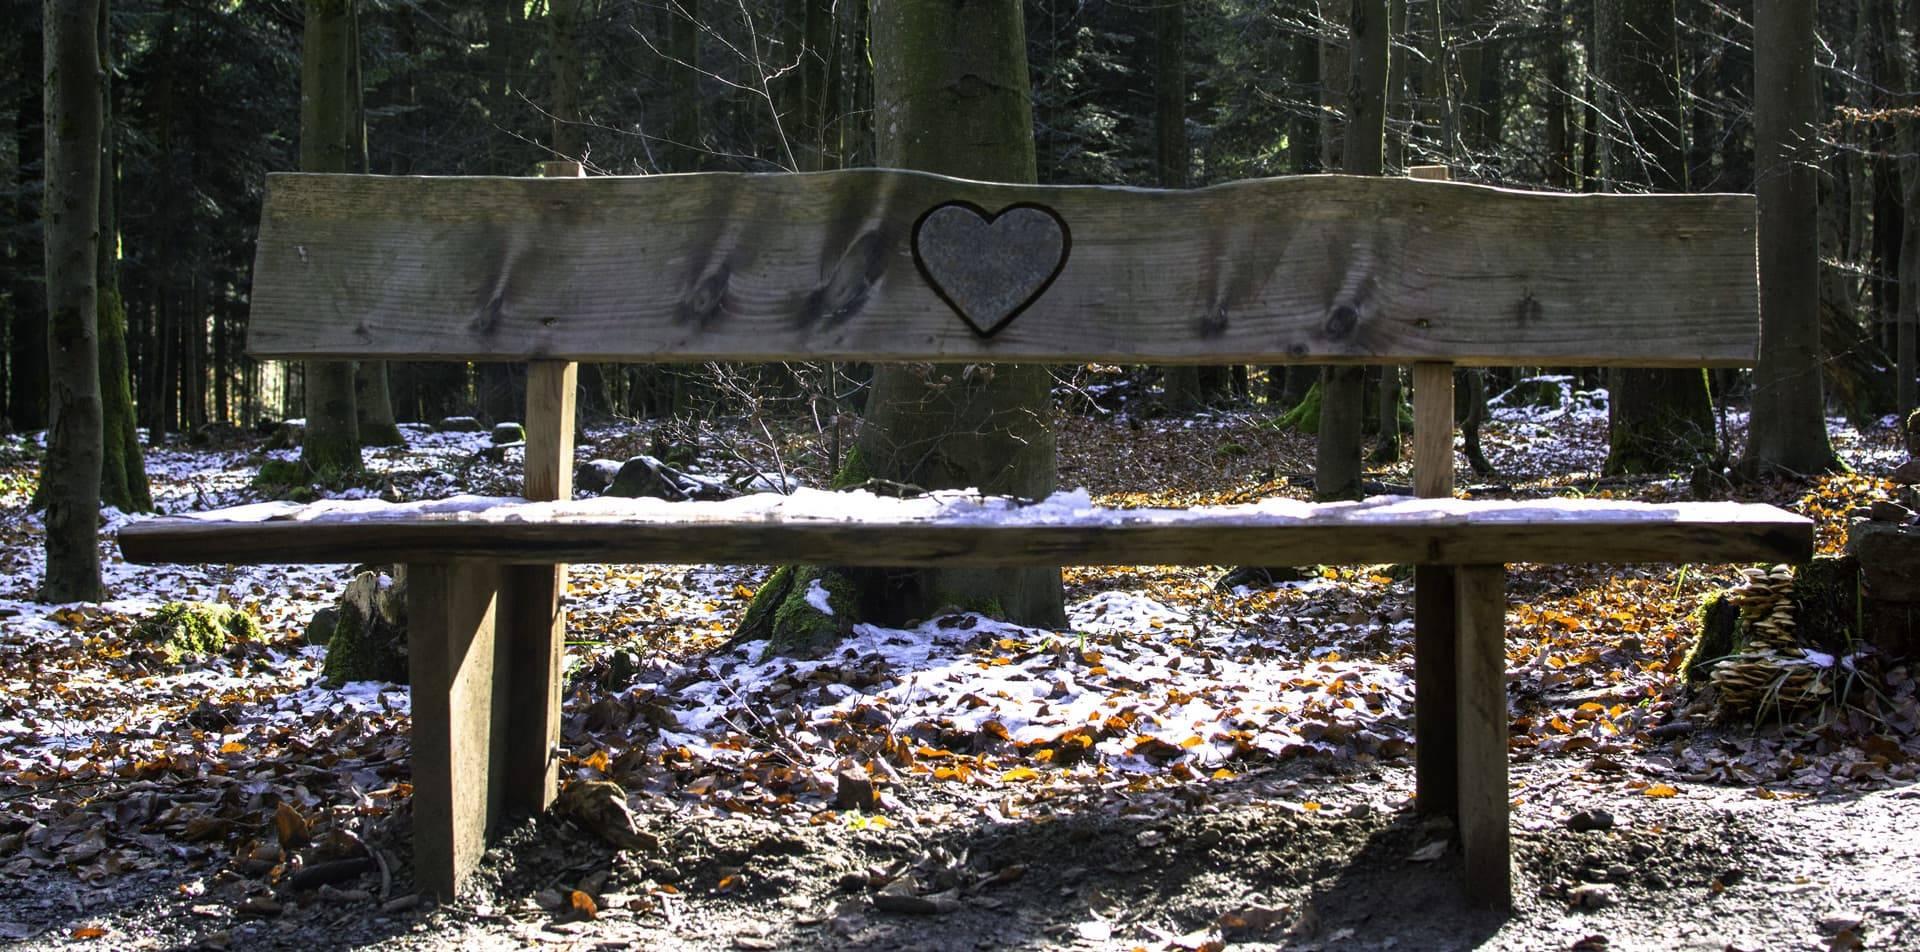 PAD_Saint-Valentin_amour_Hiver_banc_parc_loup_Header_Unsplash_1920x951.jpg